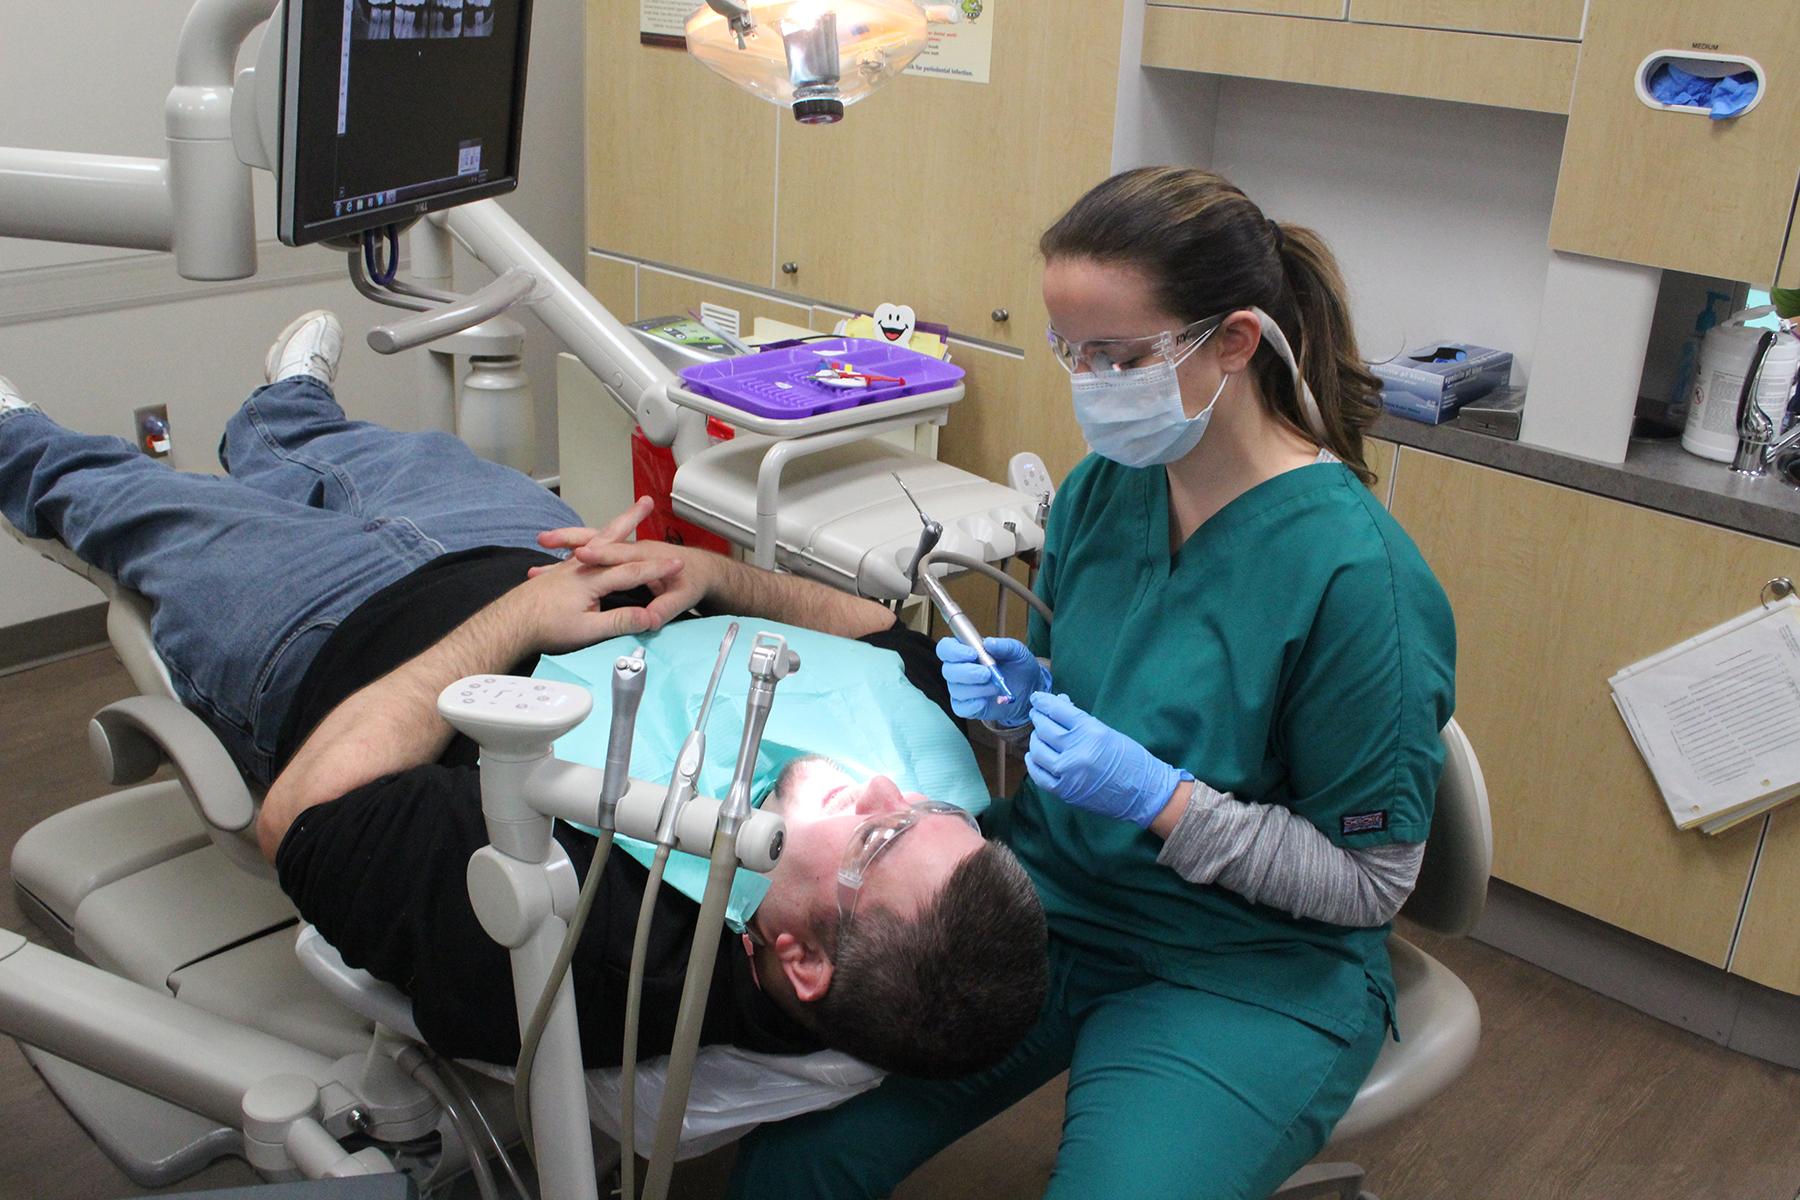 cvtc clinic to offer free dental care to veterans on nov 12